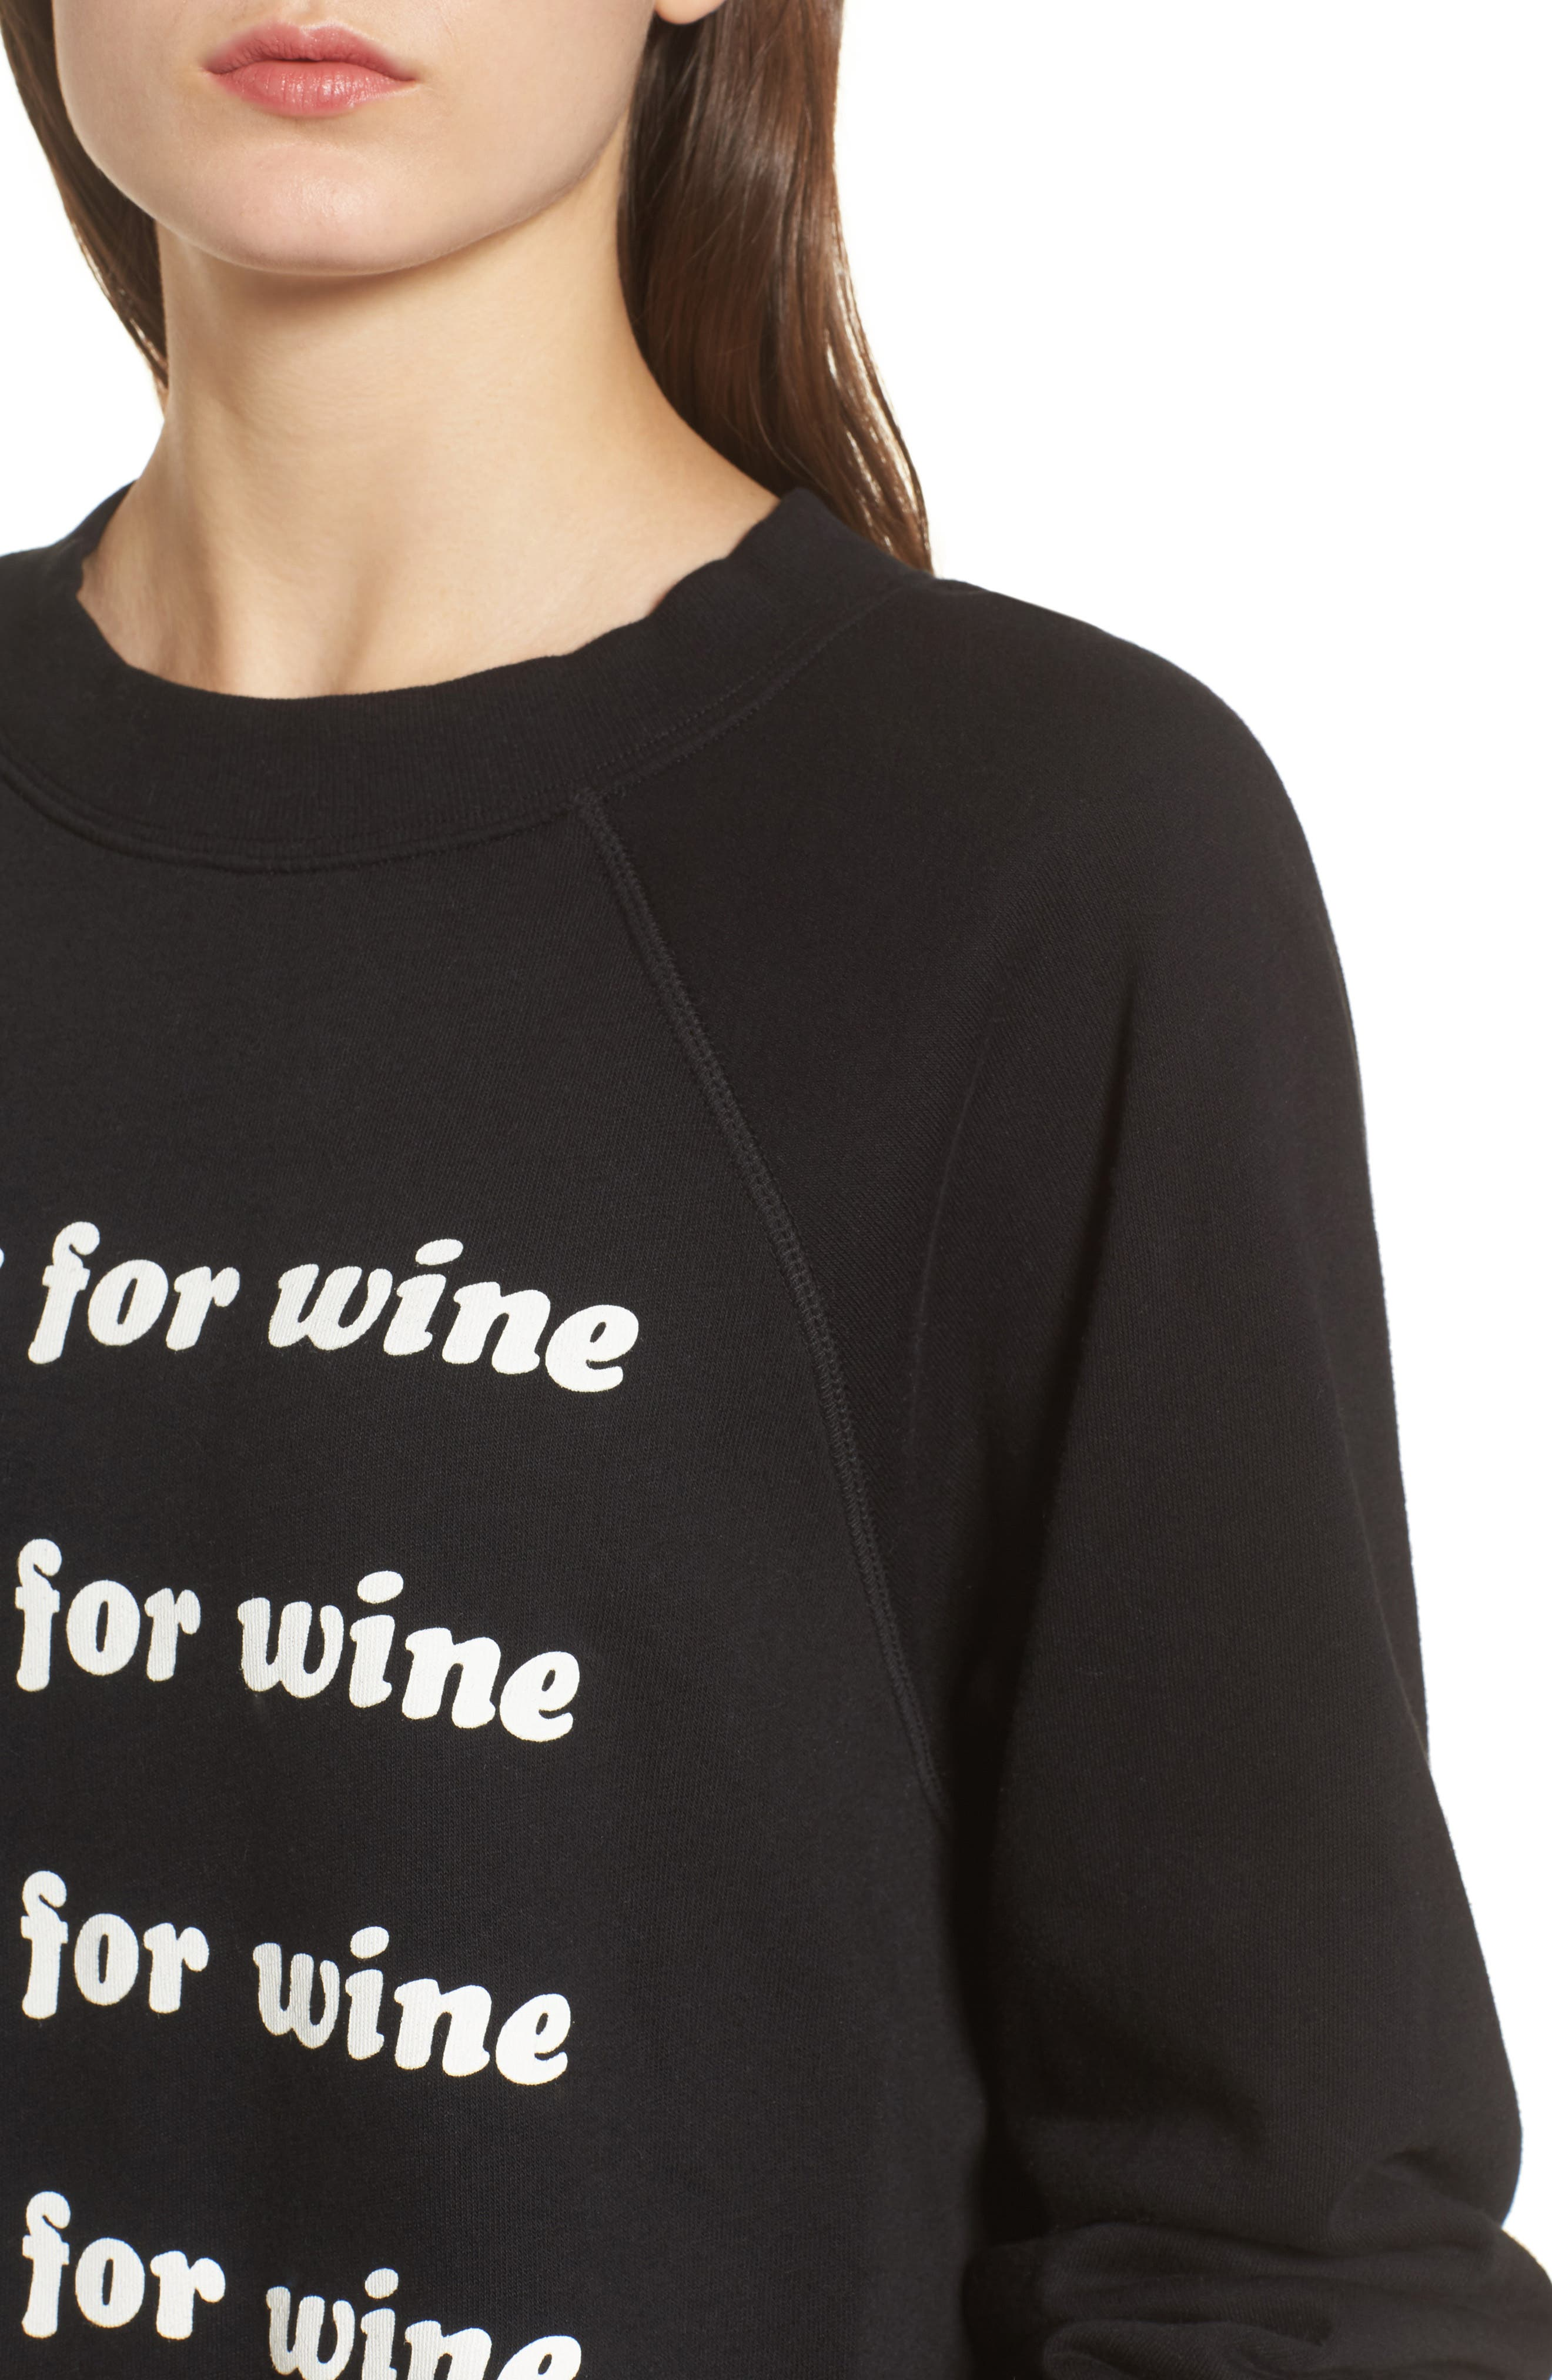 Wino - Sommers Sweatshirt,                             Alternate thumbnail 4, color,                             Black